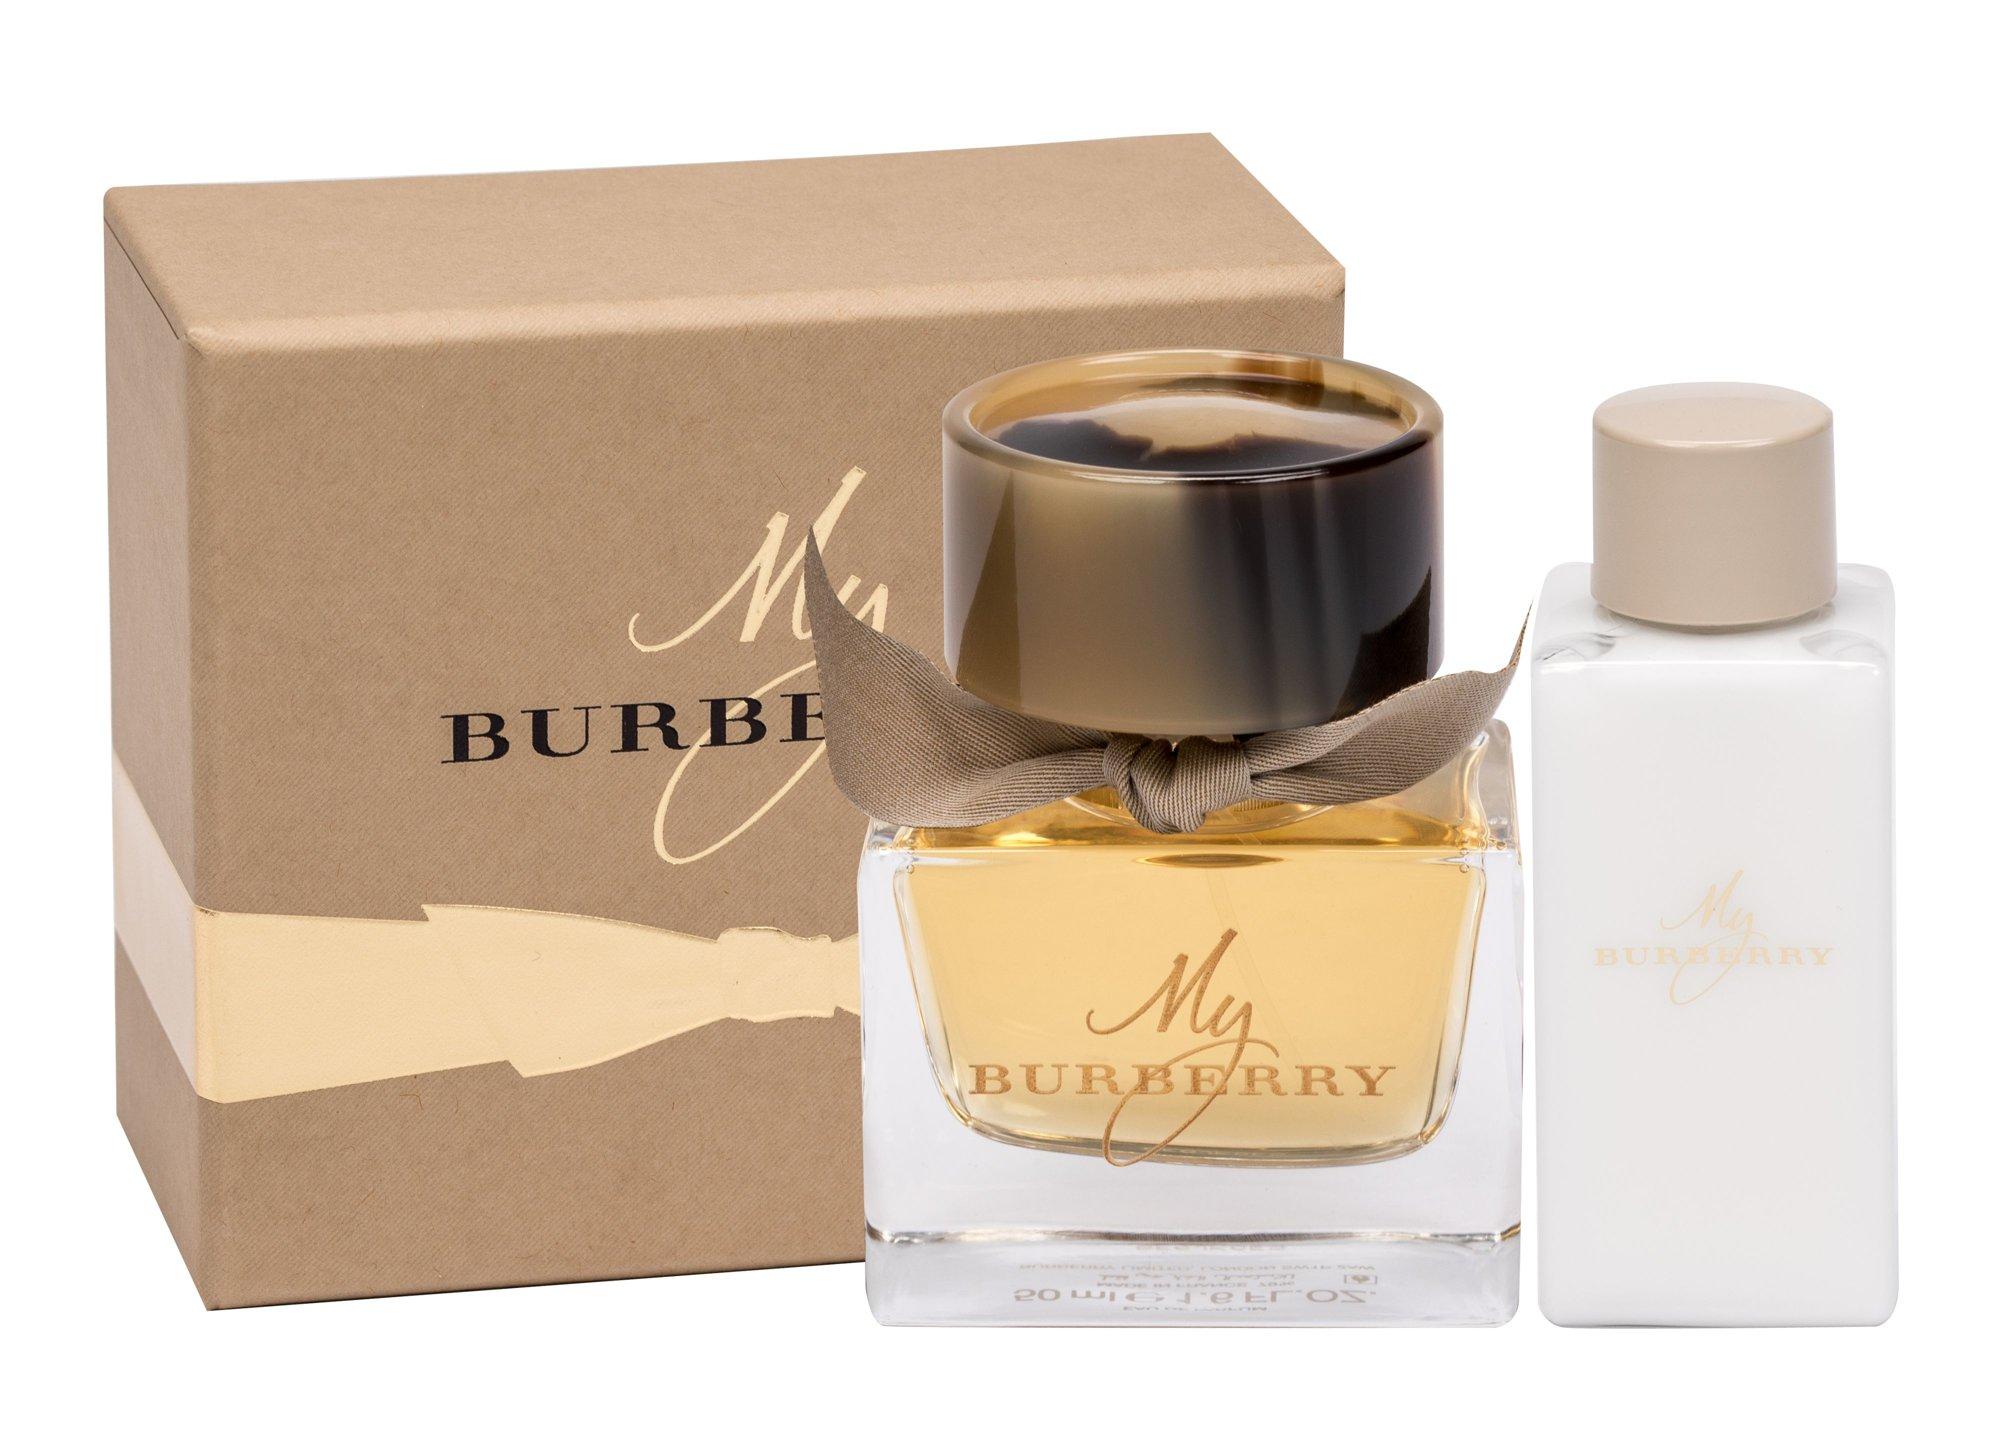 Burberry My Burberry, parfumovaná voda 50 ml + Tělové mléko 75 ml